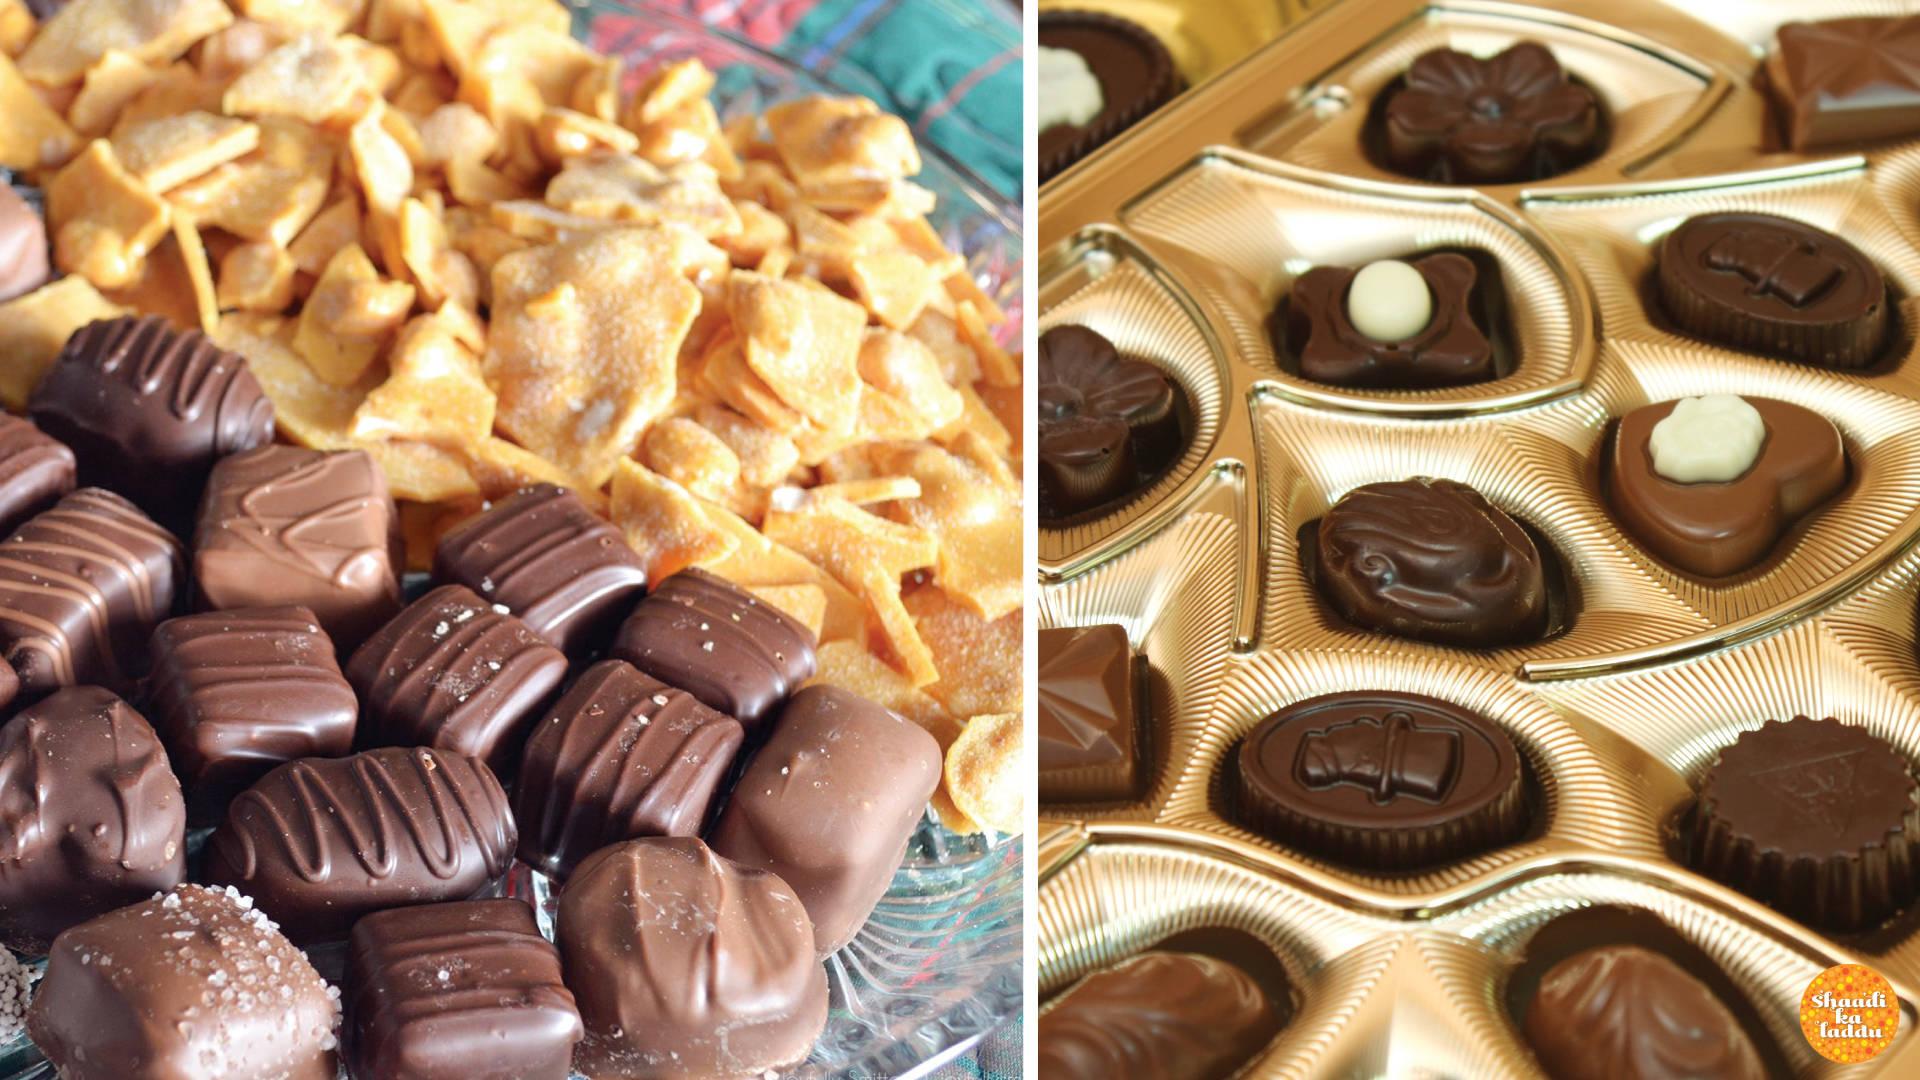 Chocolates from Smitten Bakery